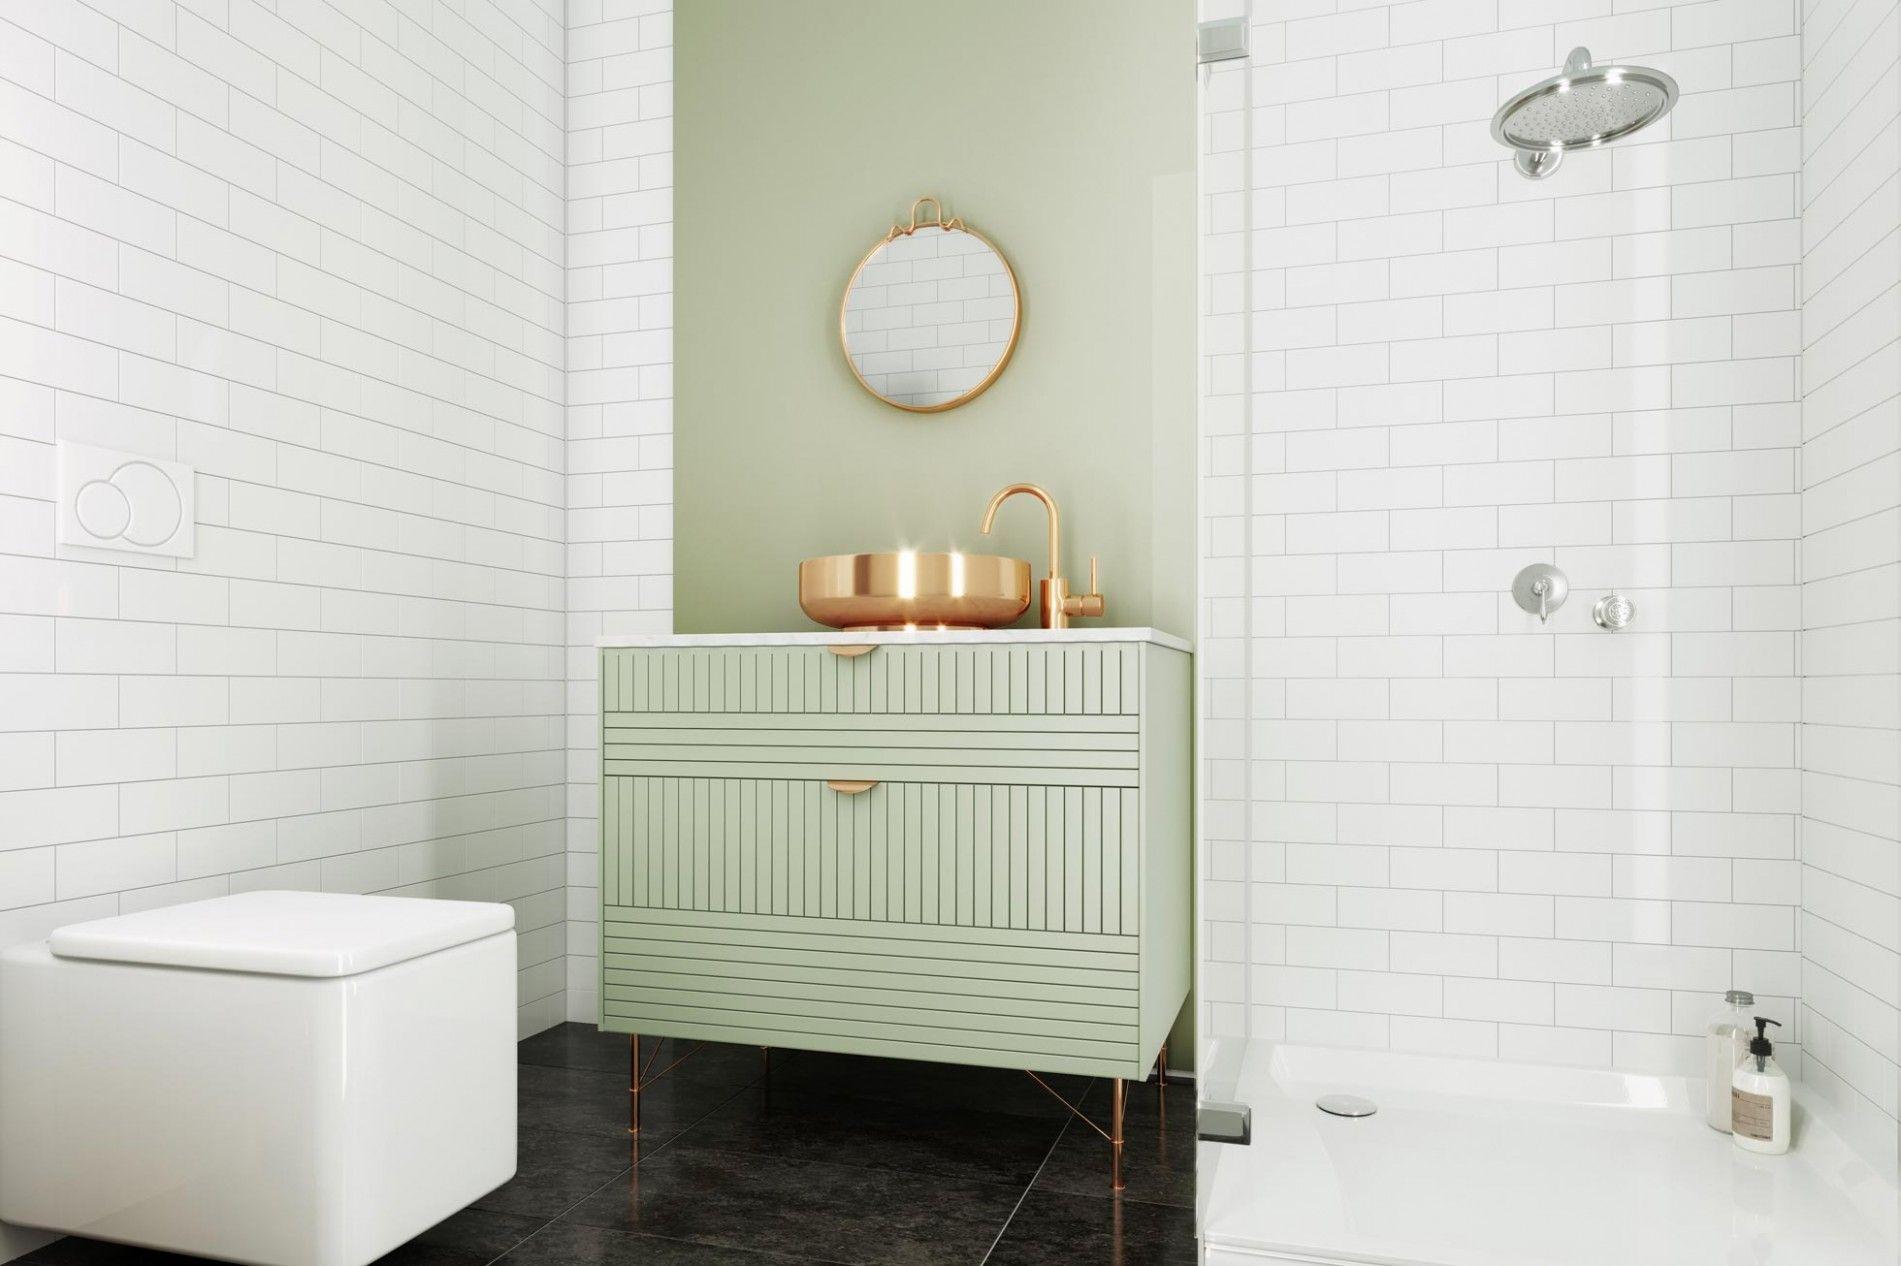 Bathroom Wall Panels Online Bathroom Wall Panels Online Bathroom Wall Panels Online Installing A Prefabricated Molded Fiberglass Battery Allows You To Change Di 2020